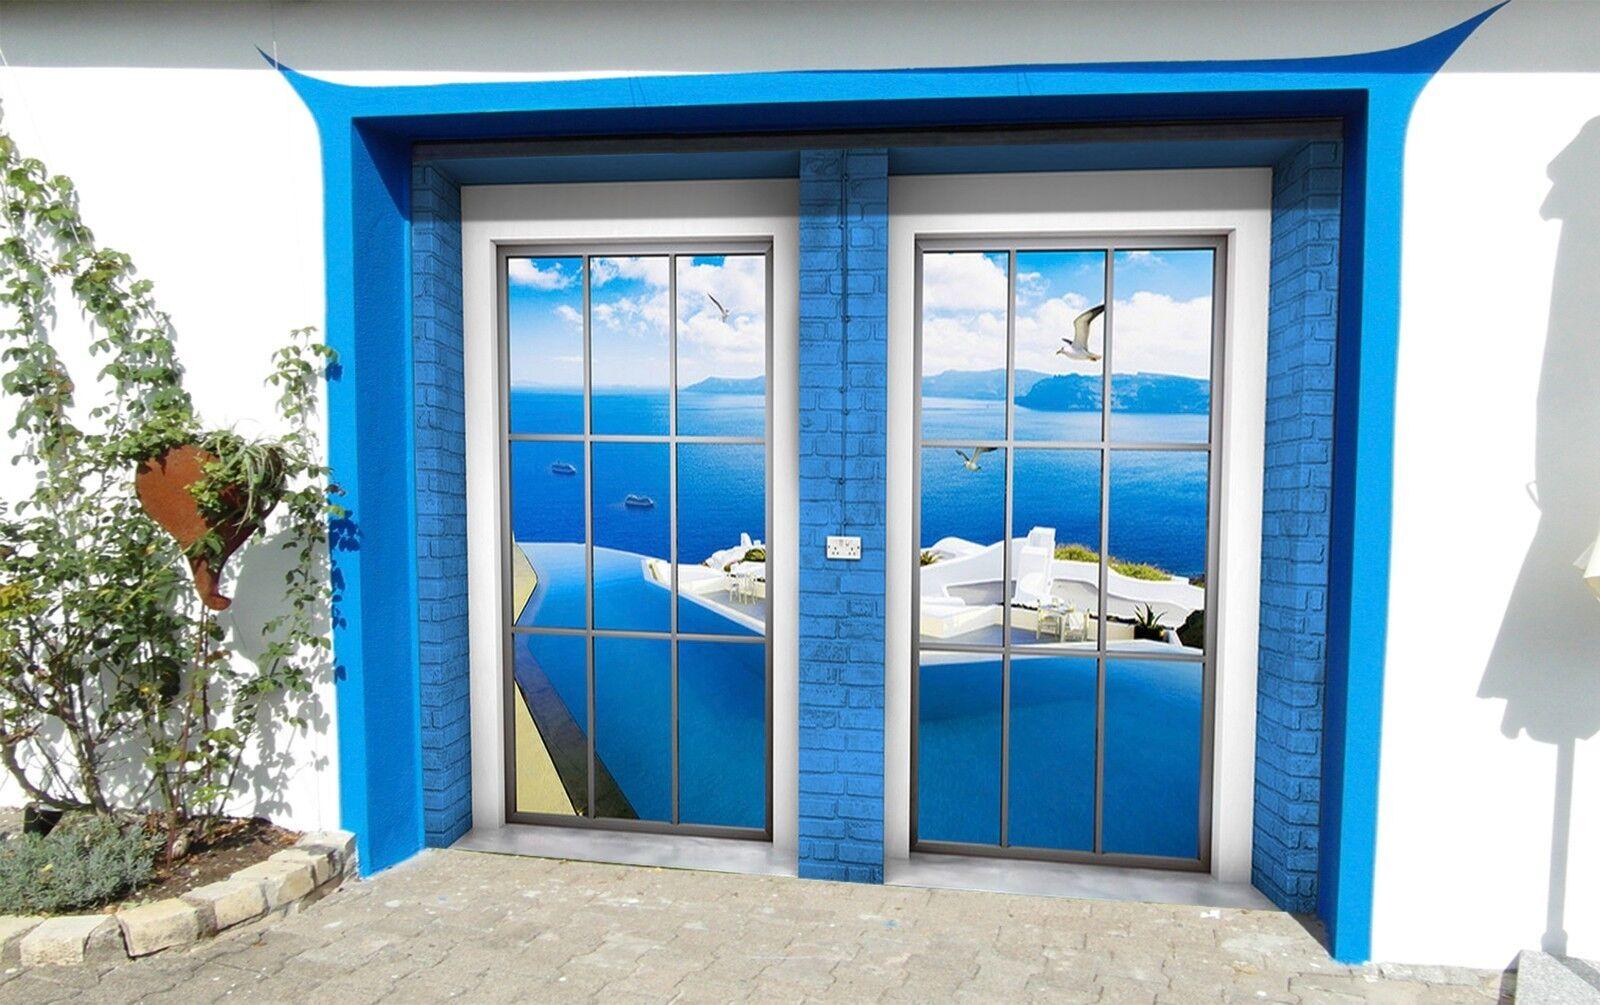 3D Blau ocean  Garage Door Murals Wall Print Decal Wall Deco AJ WALLPAPER AU